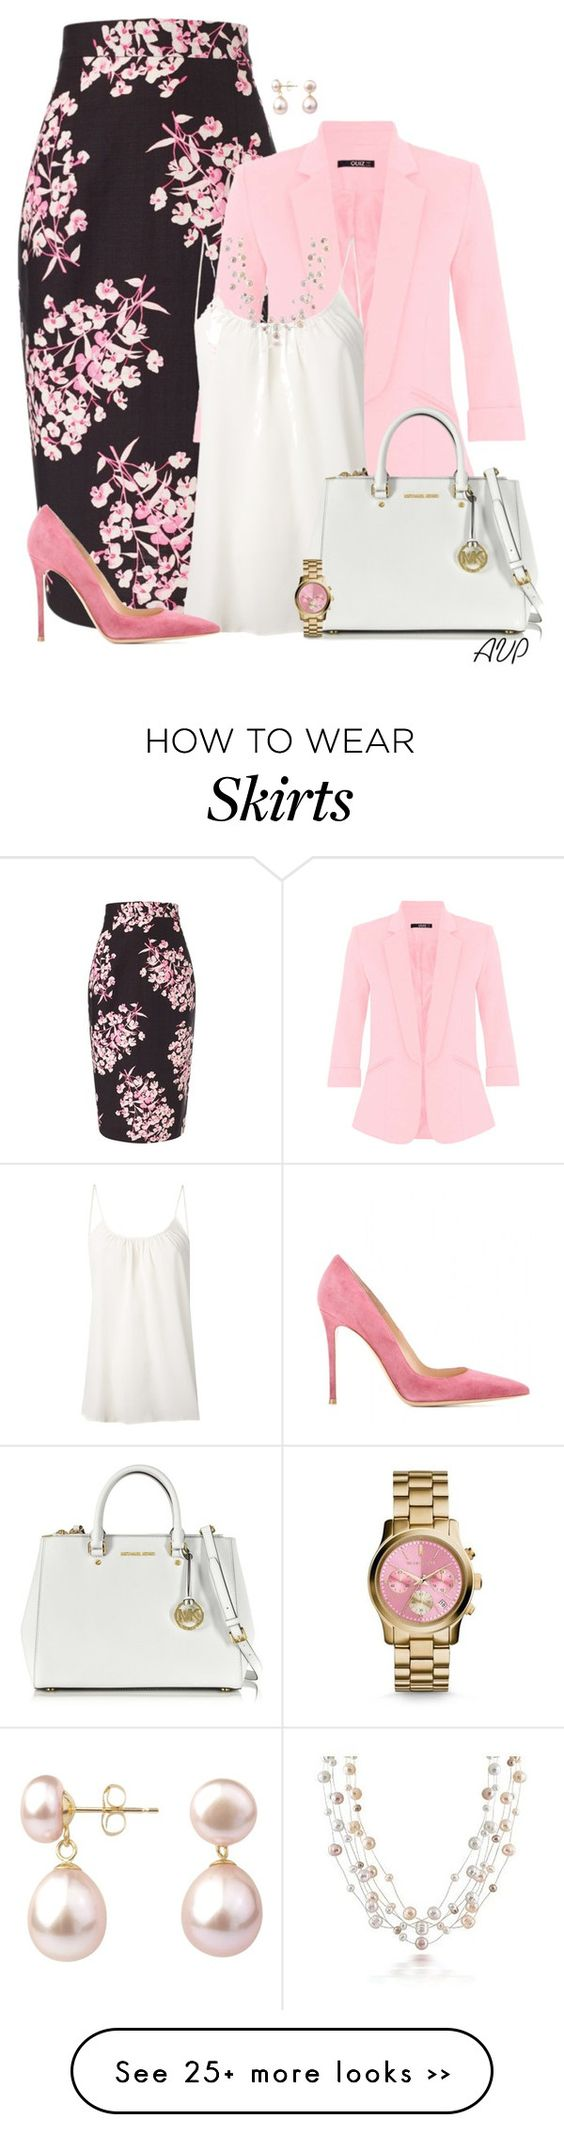 """Jonathan Saunders Black Sakura Floral Skirt"" by amy-phelps on Polyvore:"